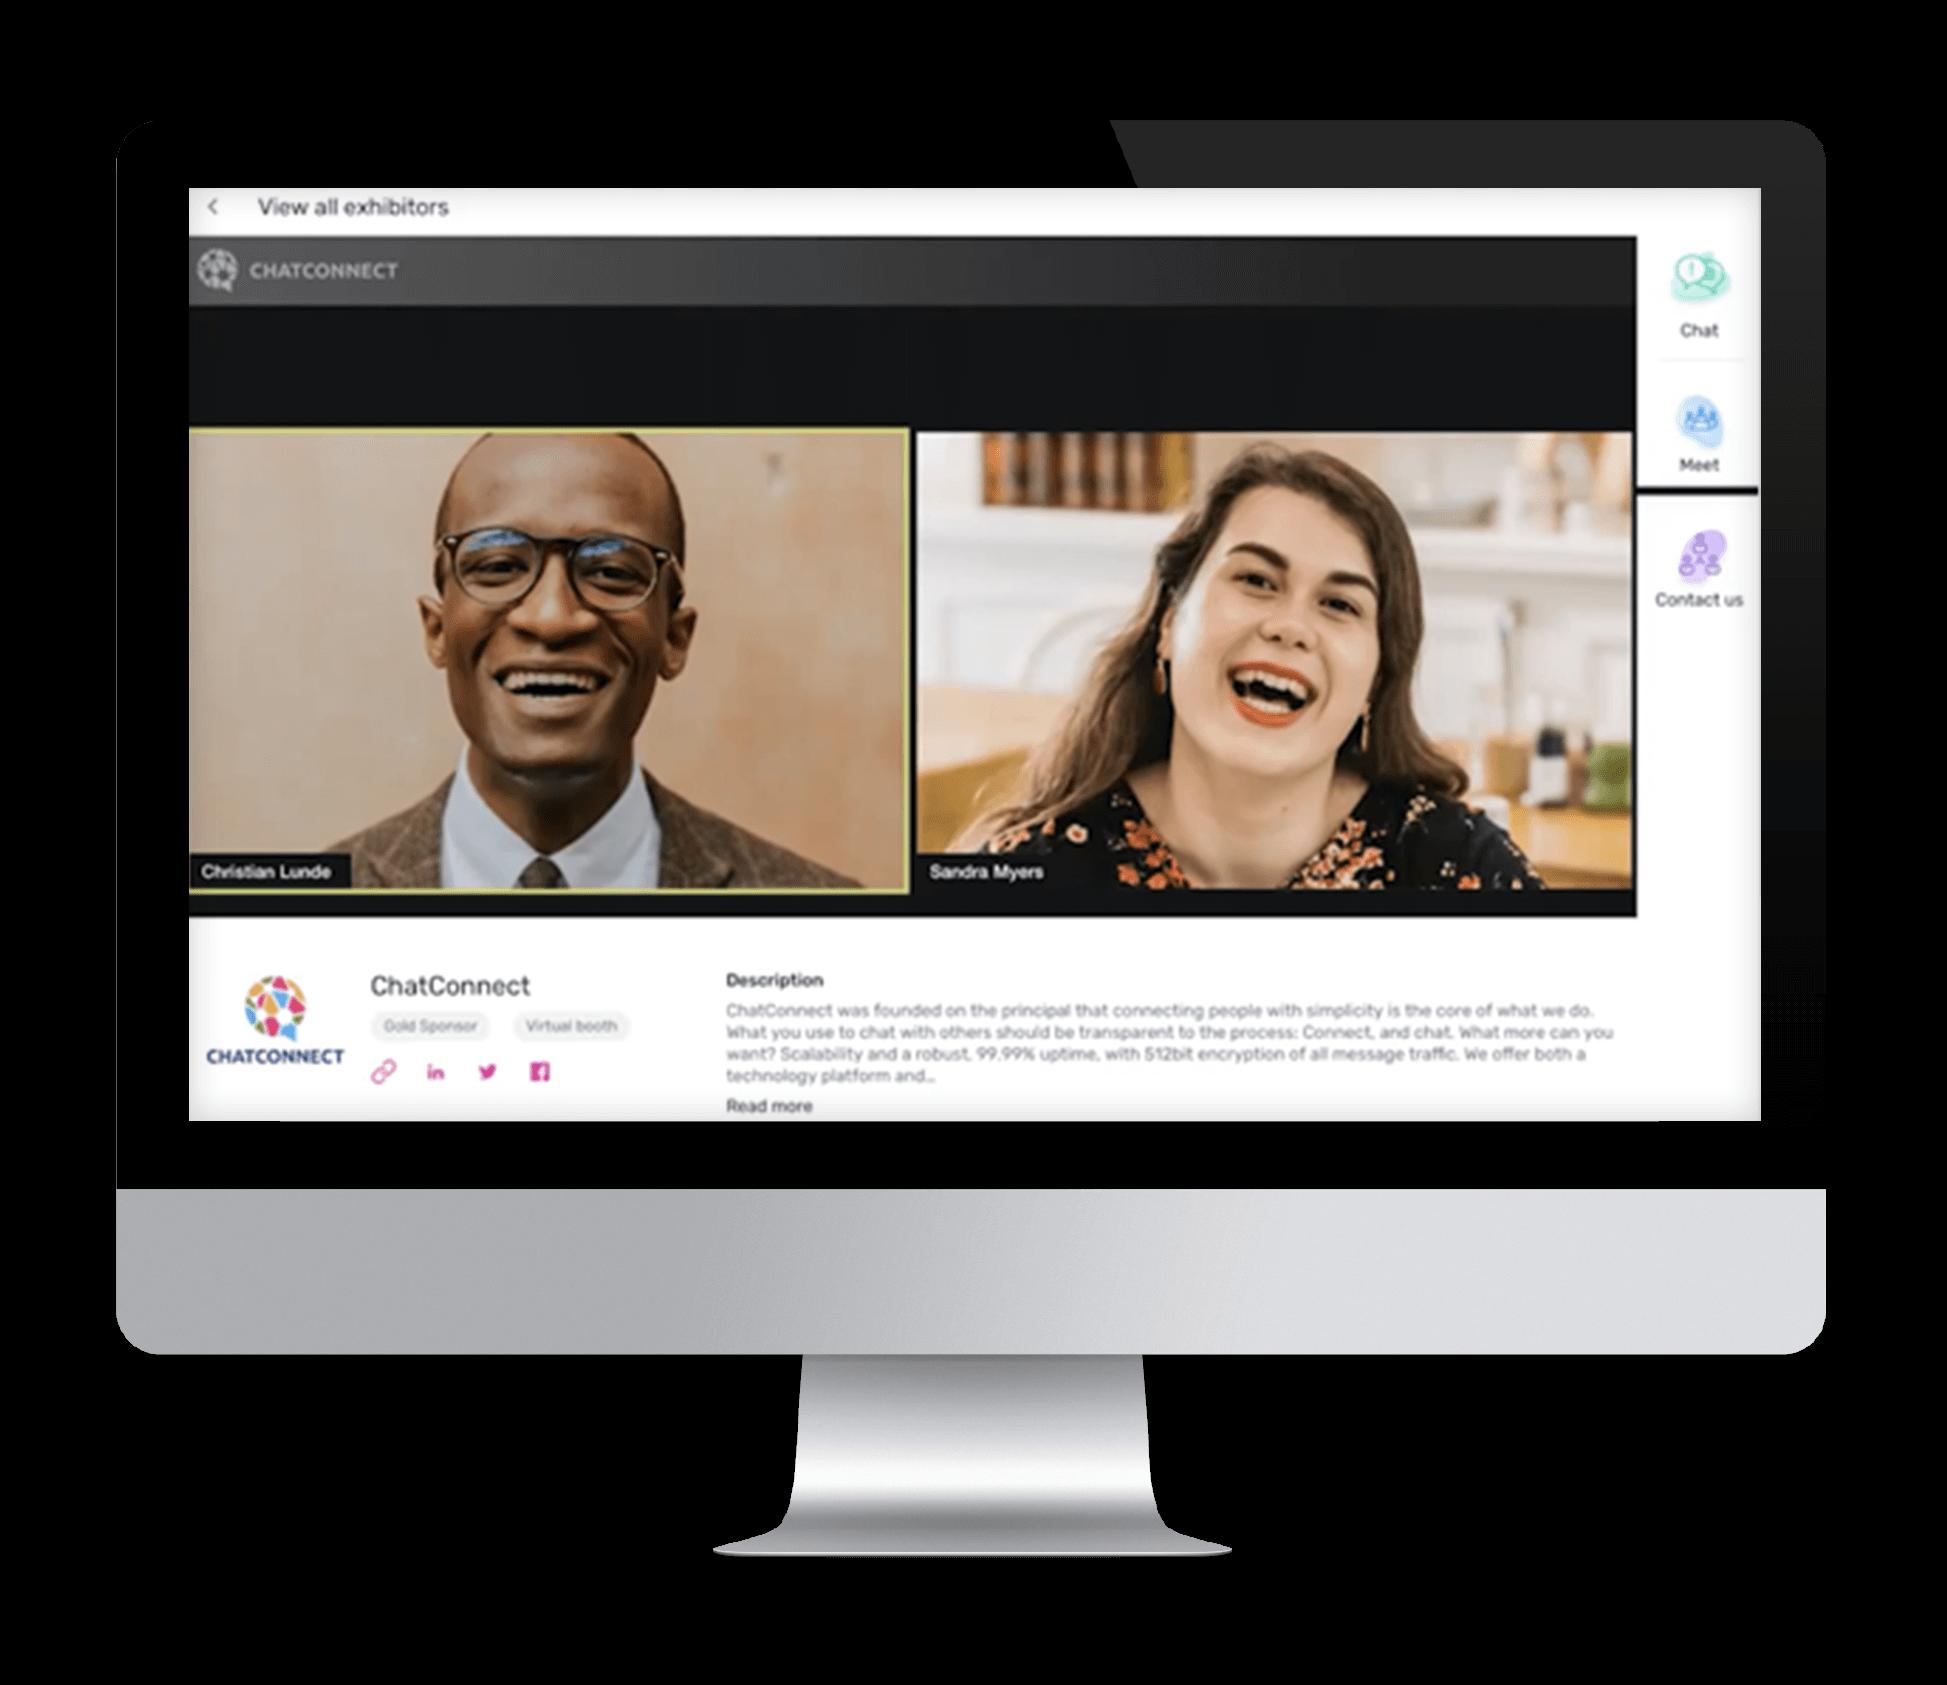 Event-App von Cvent | Leads generieren | Event-Tech-Partner